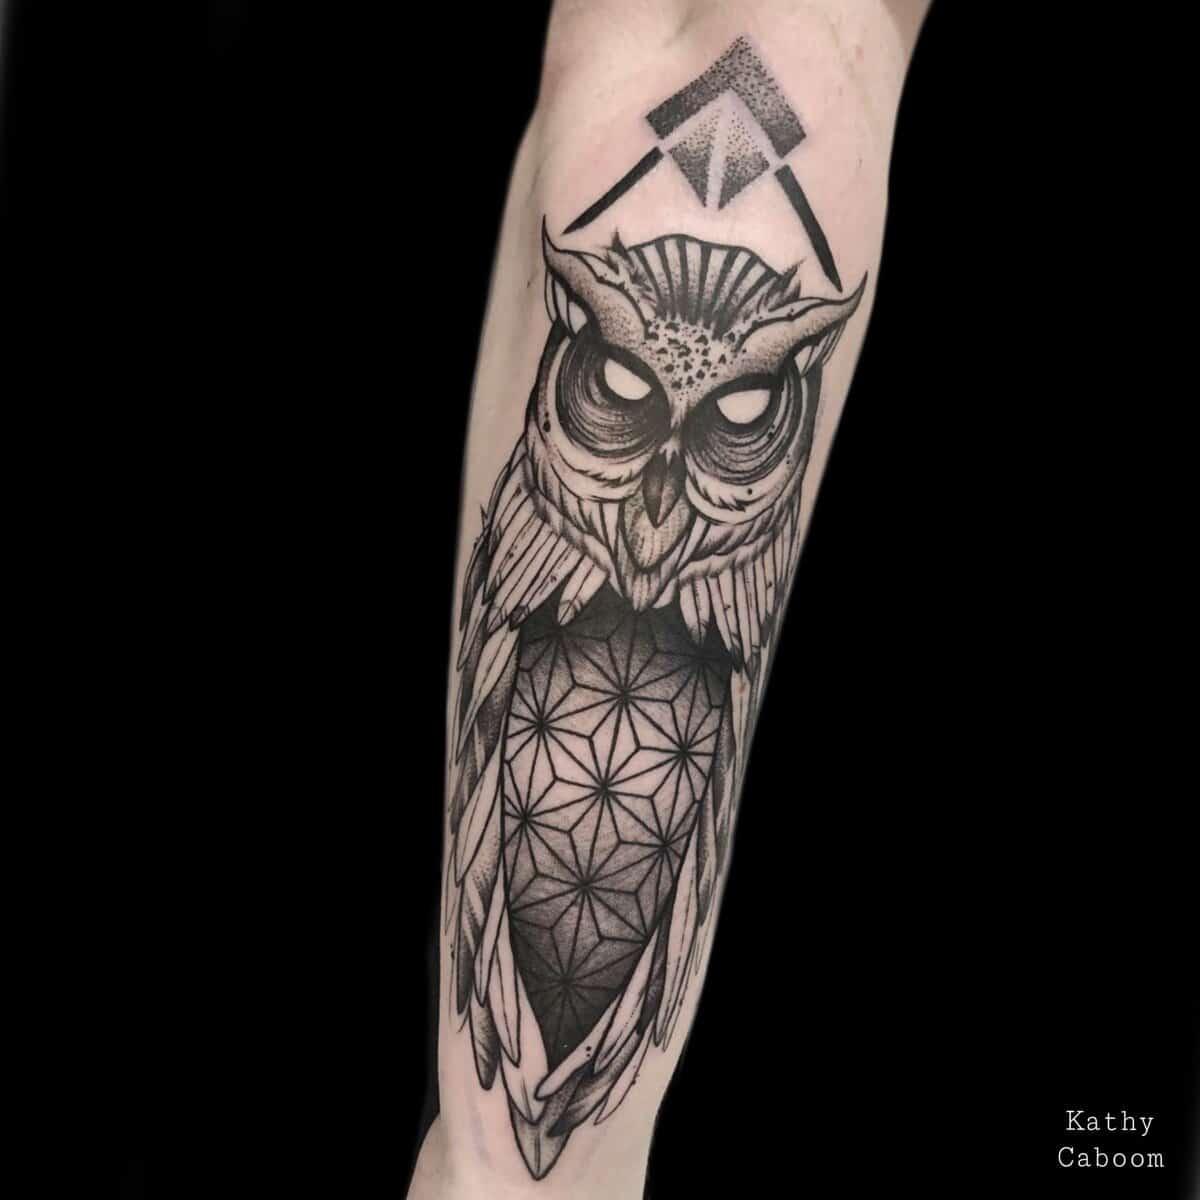 kathycaboom-tattoo-artist-owl-dotwork